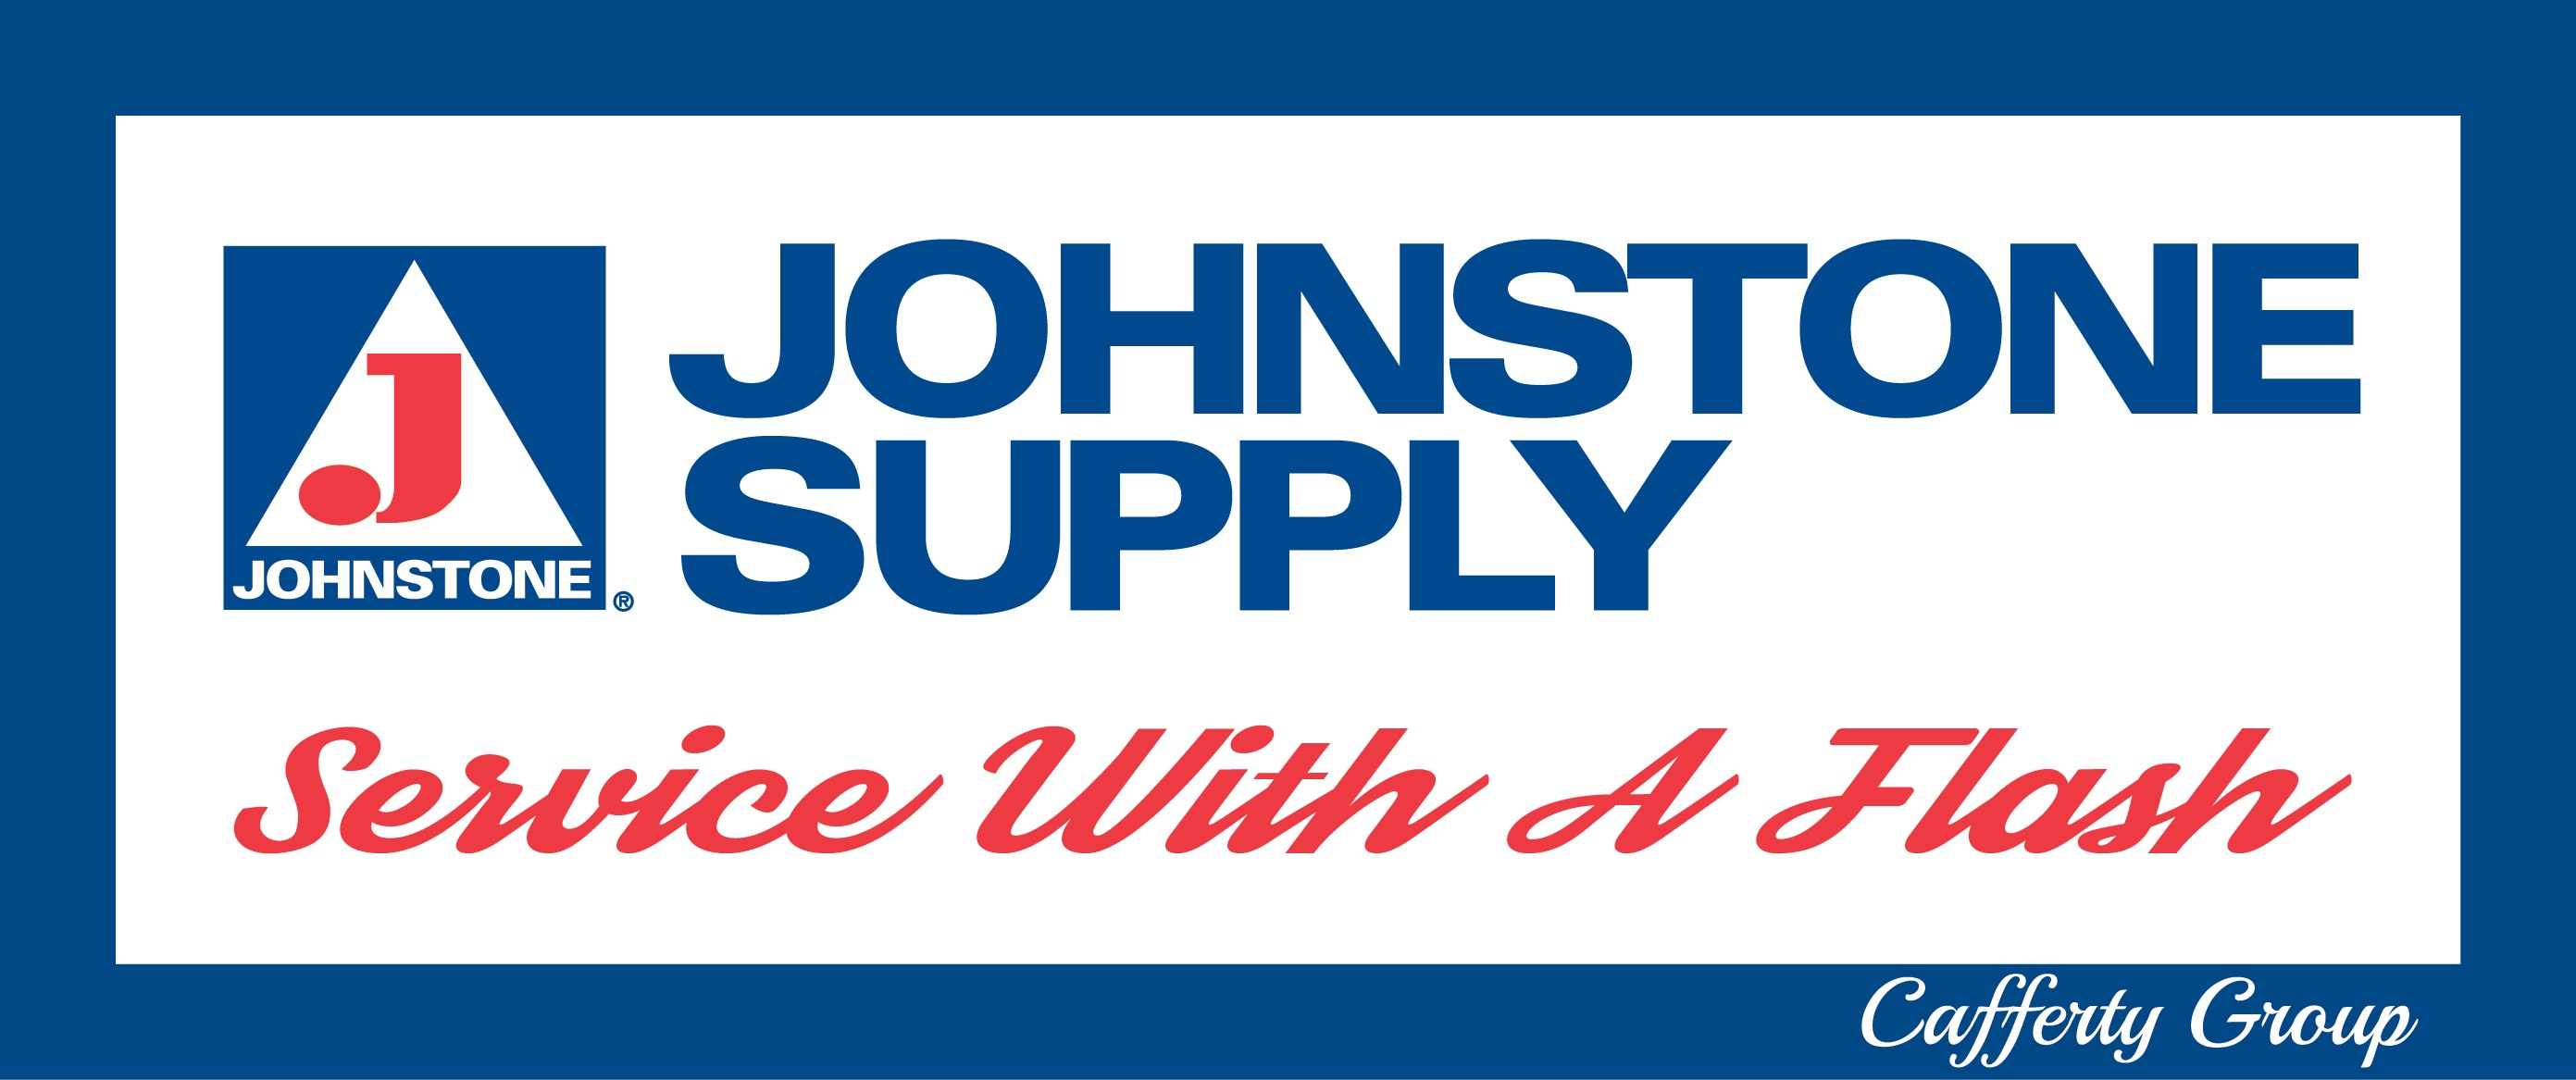 Johnstone Supply - The Cafferty Group   LinkedIn